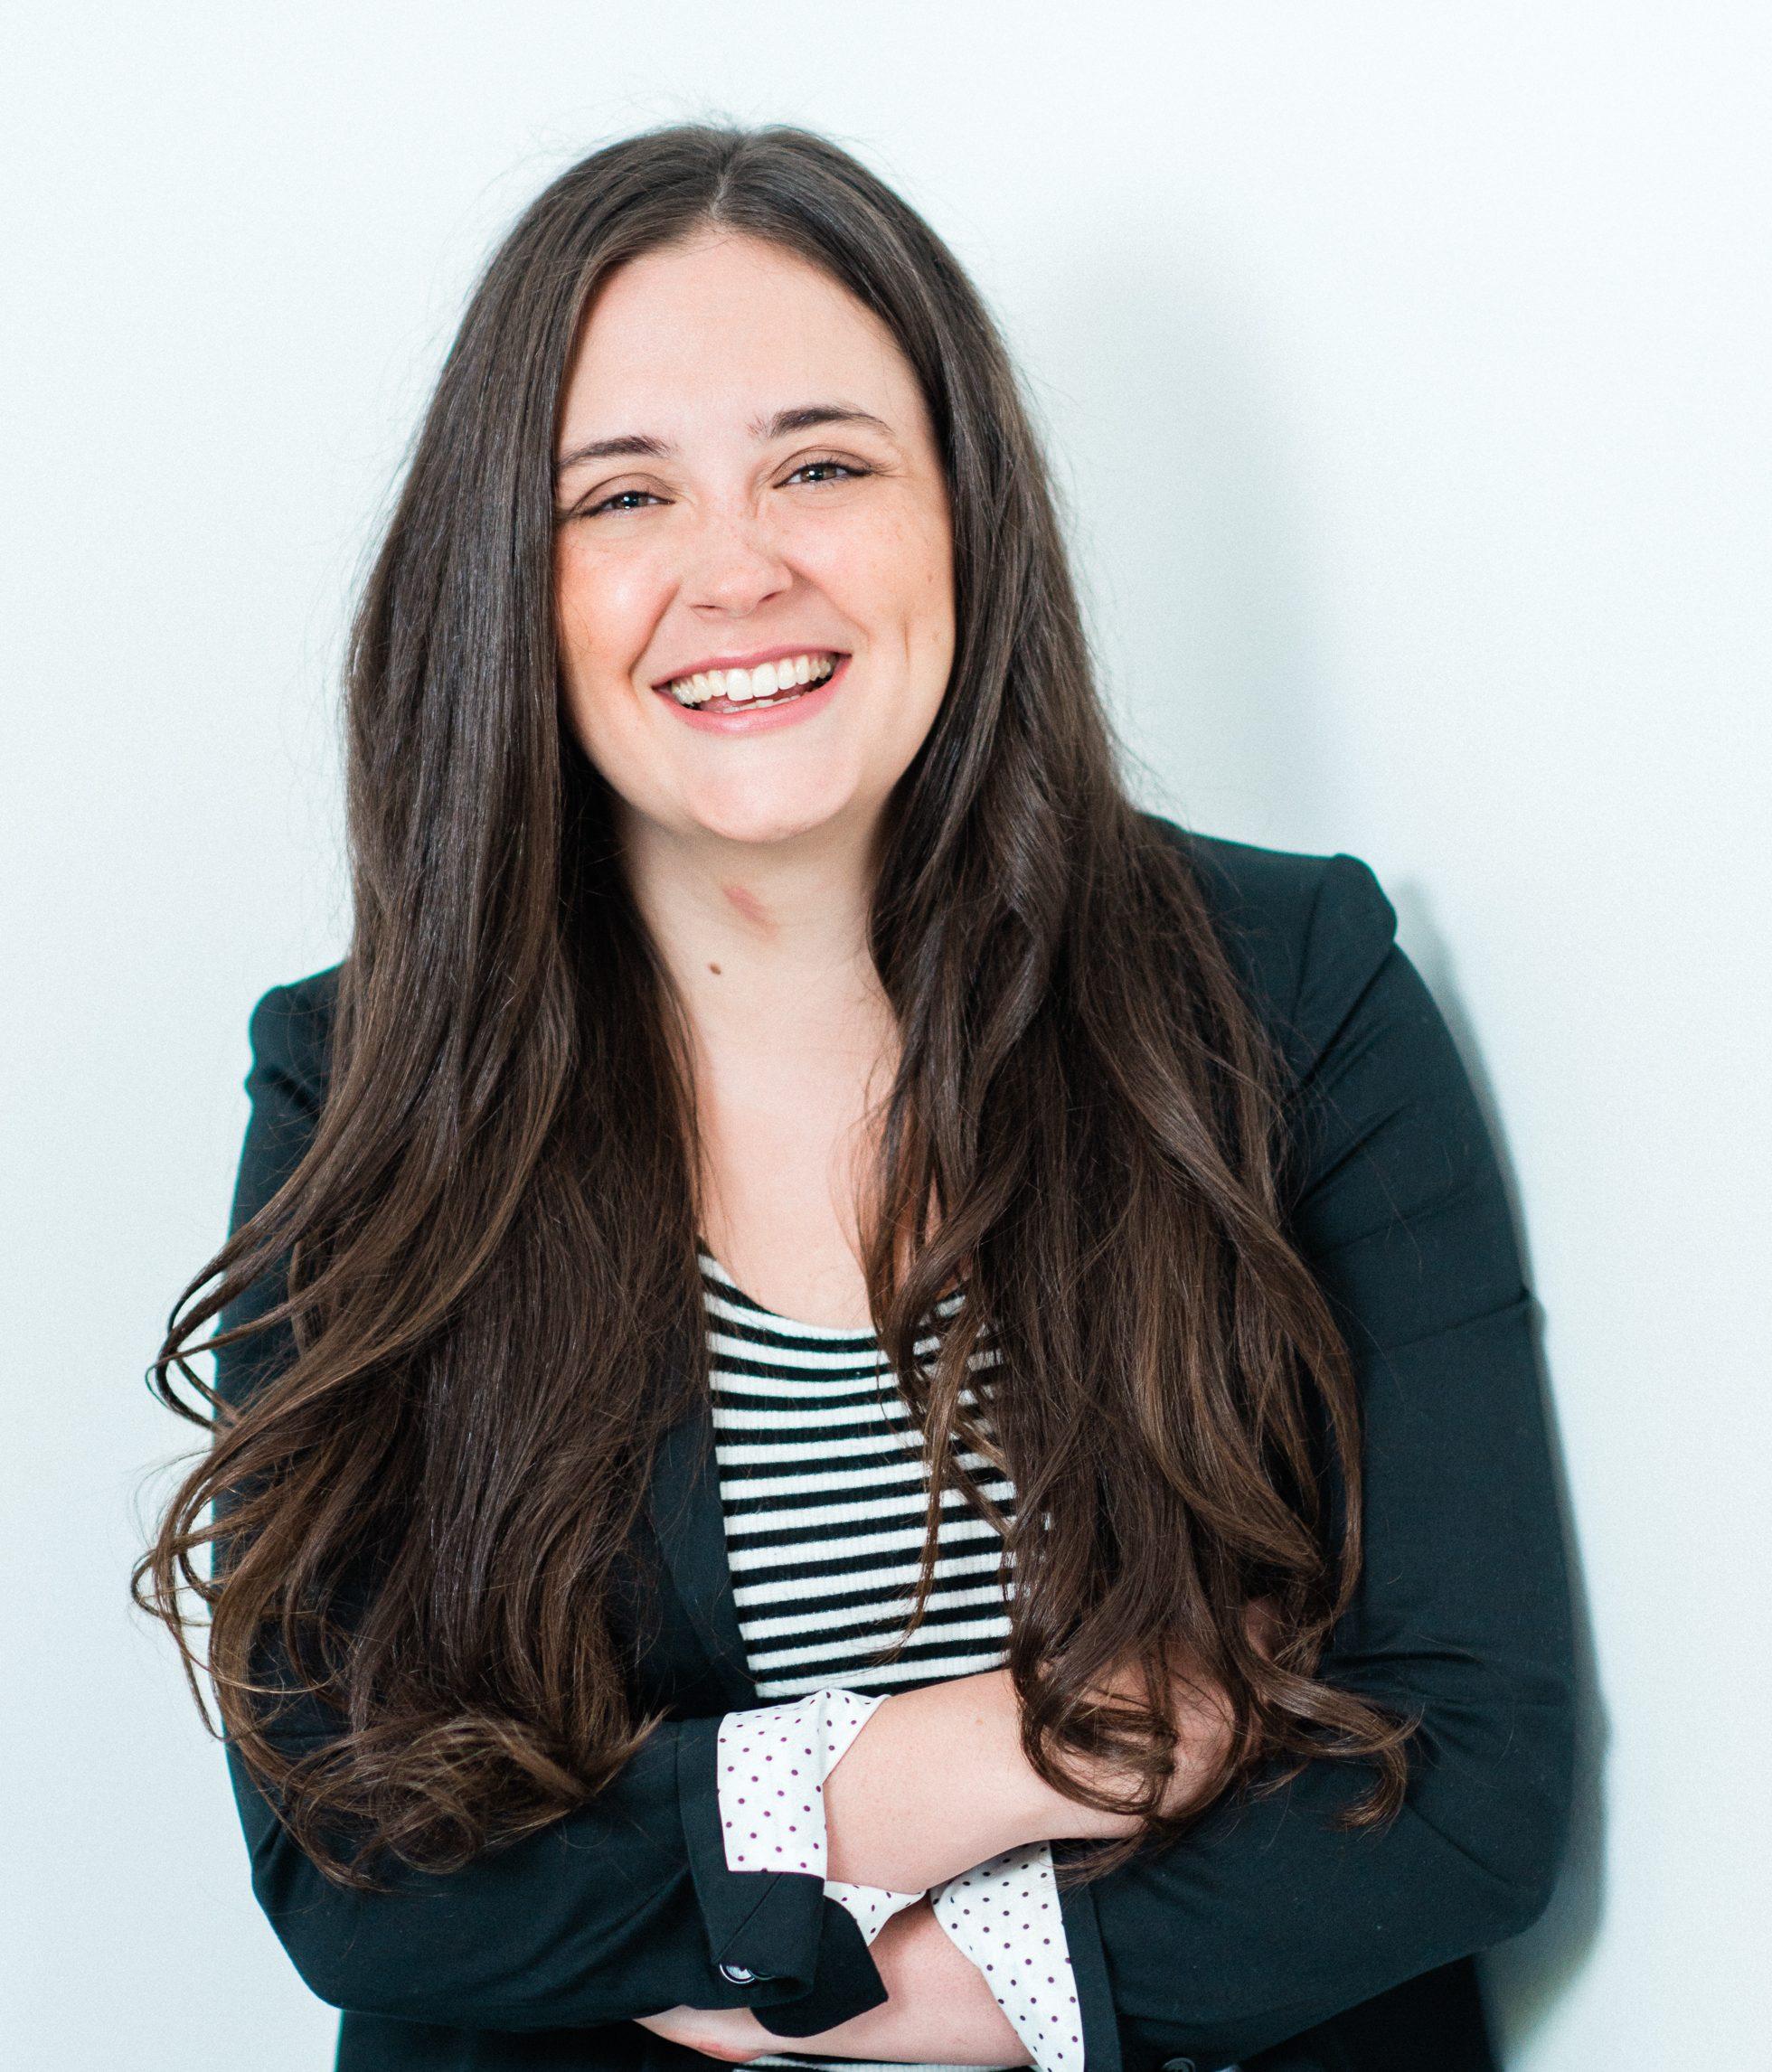 Erin Jackson, Managing Partner at Jackson LLP Healthcare Lawyers